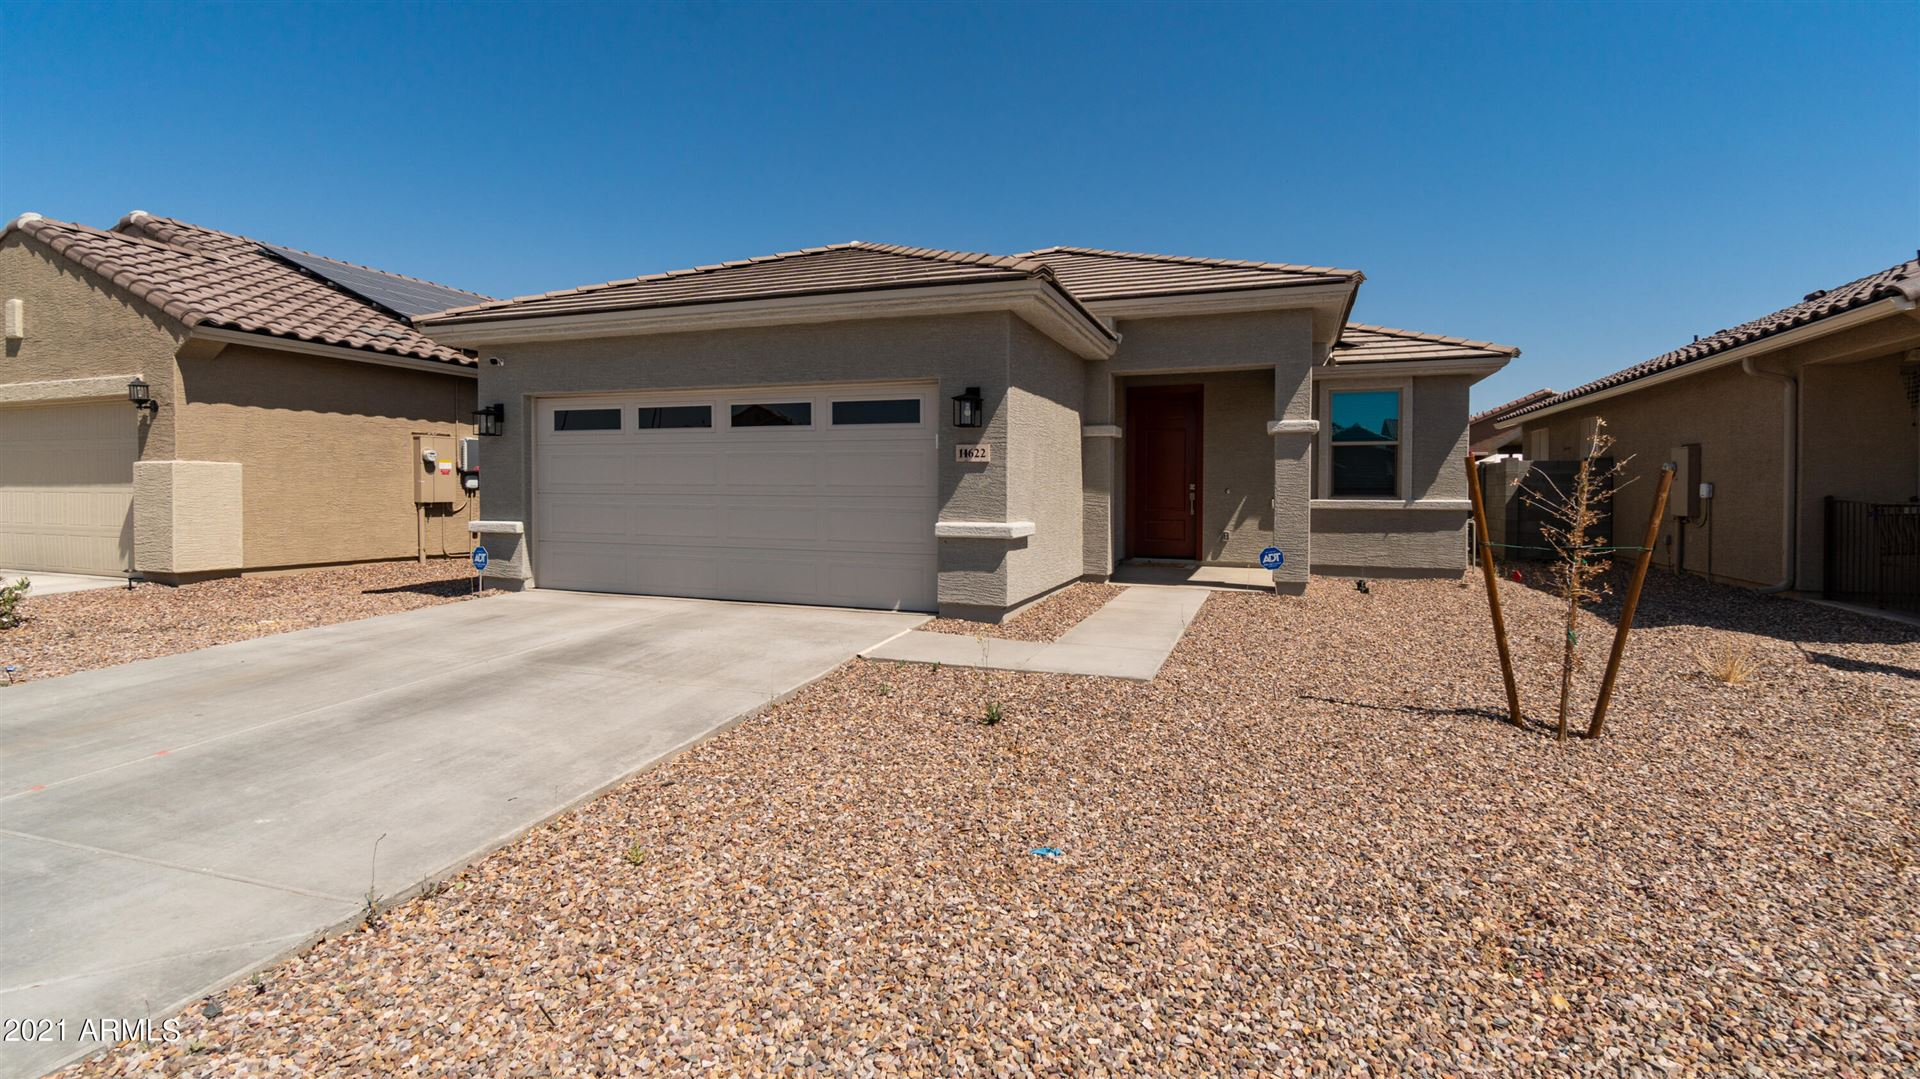 Photo of 11622 W Ventura Street, El Mirage, AZ 85335 (MLS # 6286396)